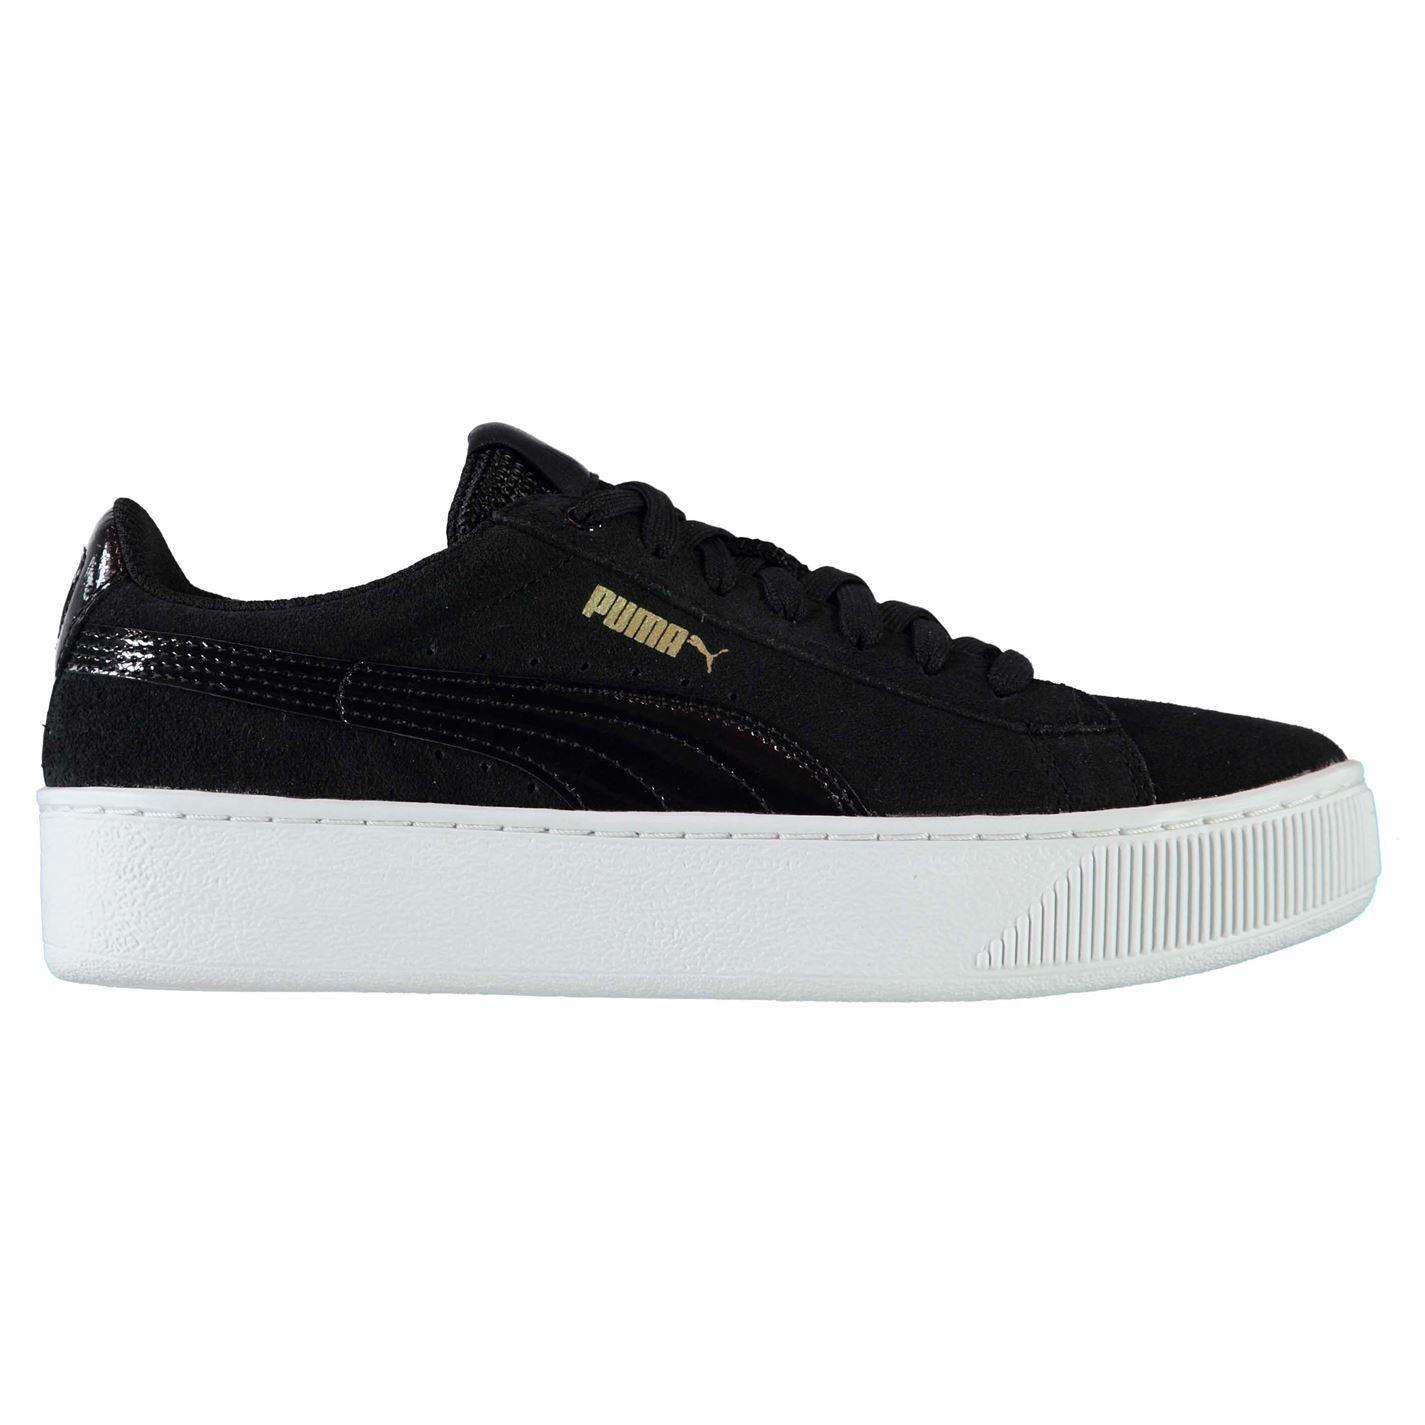 ... Puma Vikky Platform Trainers Womens Black Wht Sports Trainers Sneakers  ... 48b6dabde62